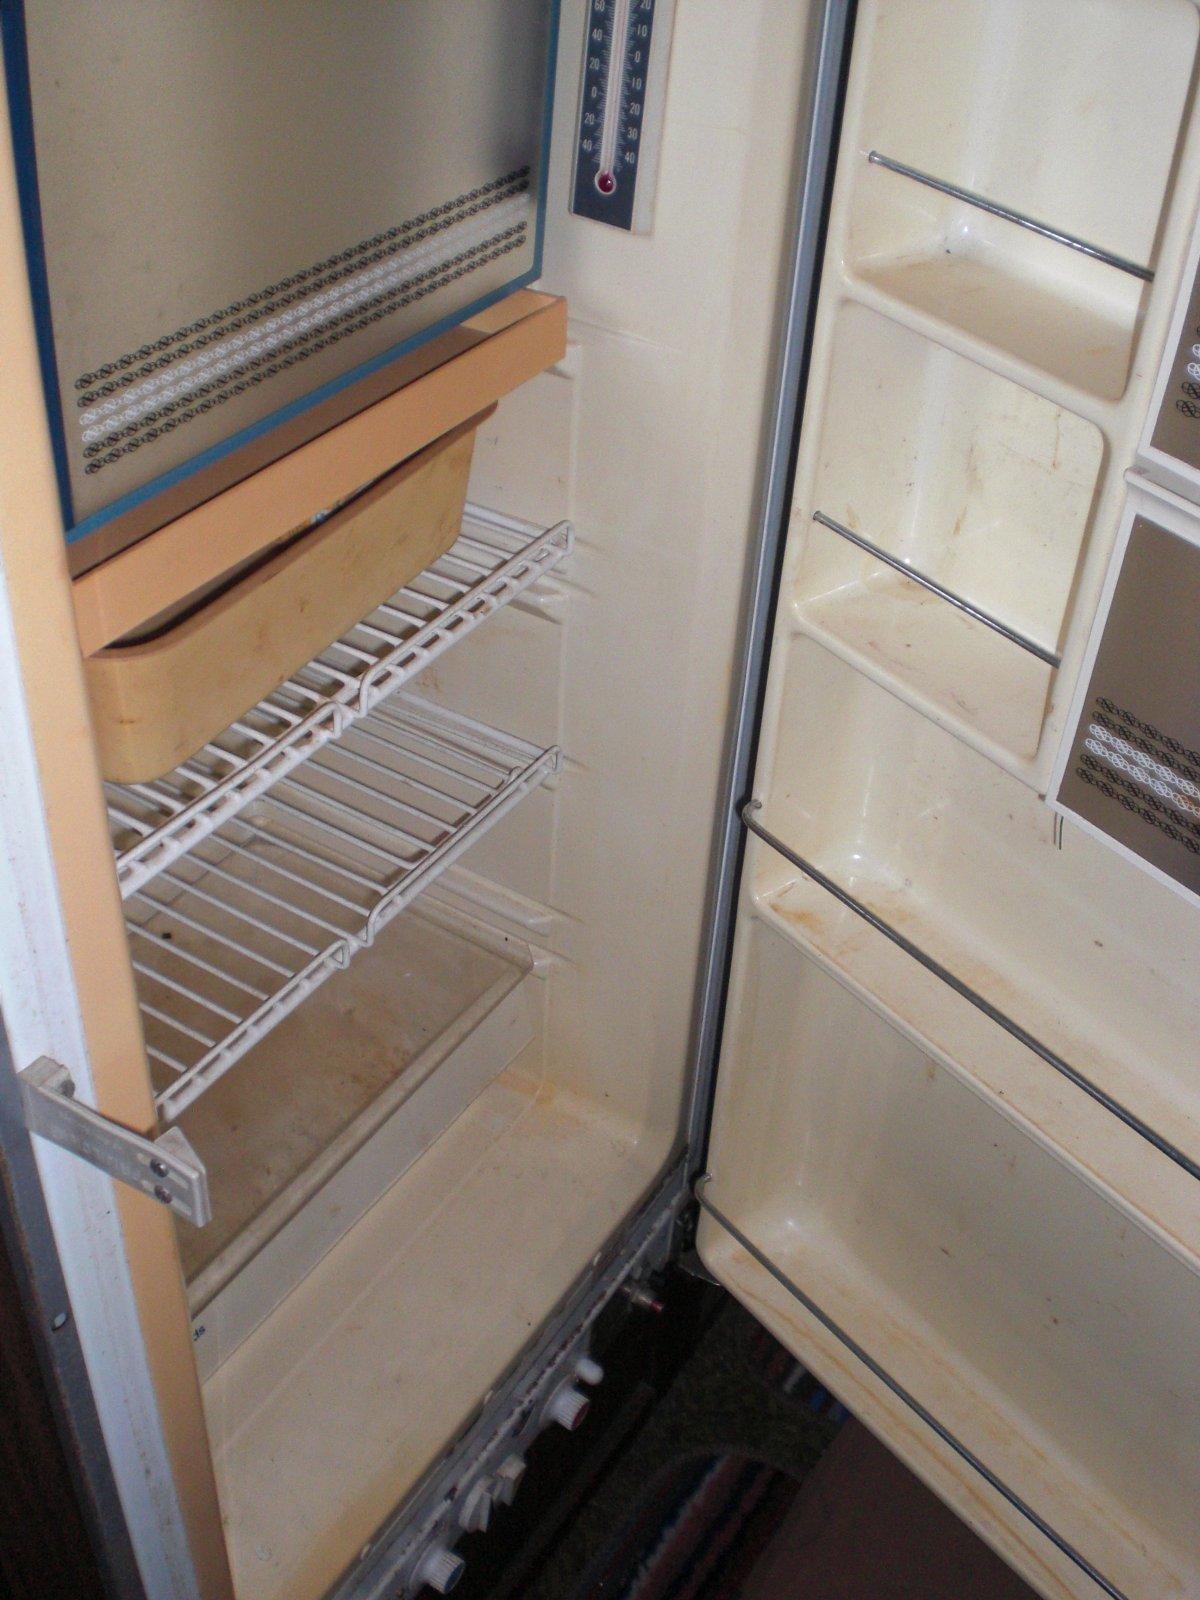 Click image for larger version  Name:fridge.jpg Views:59 Size:248.2 KB ID:9781